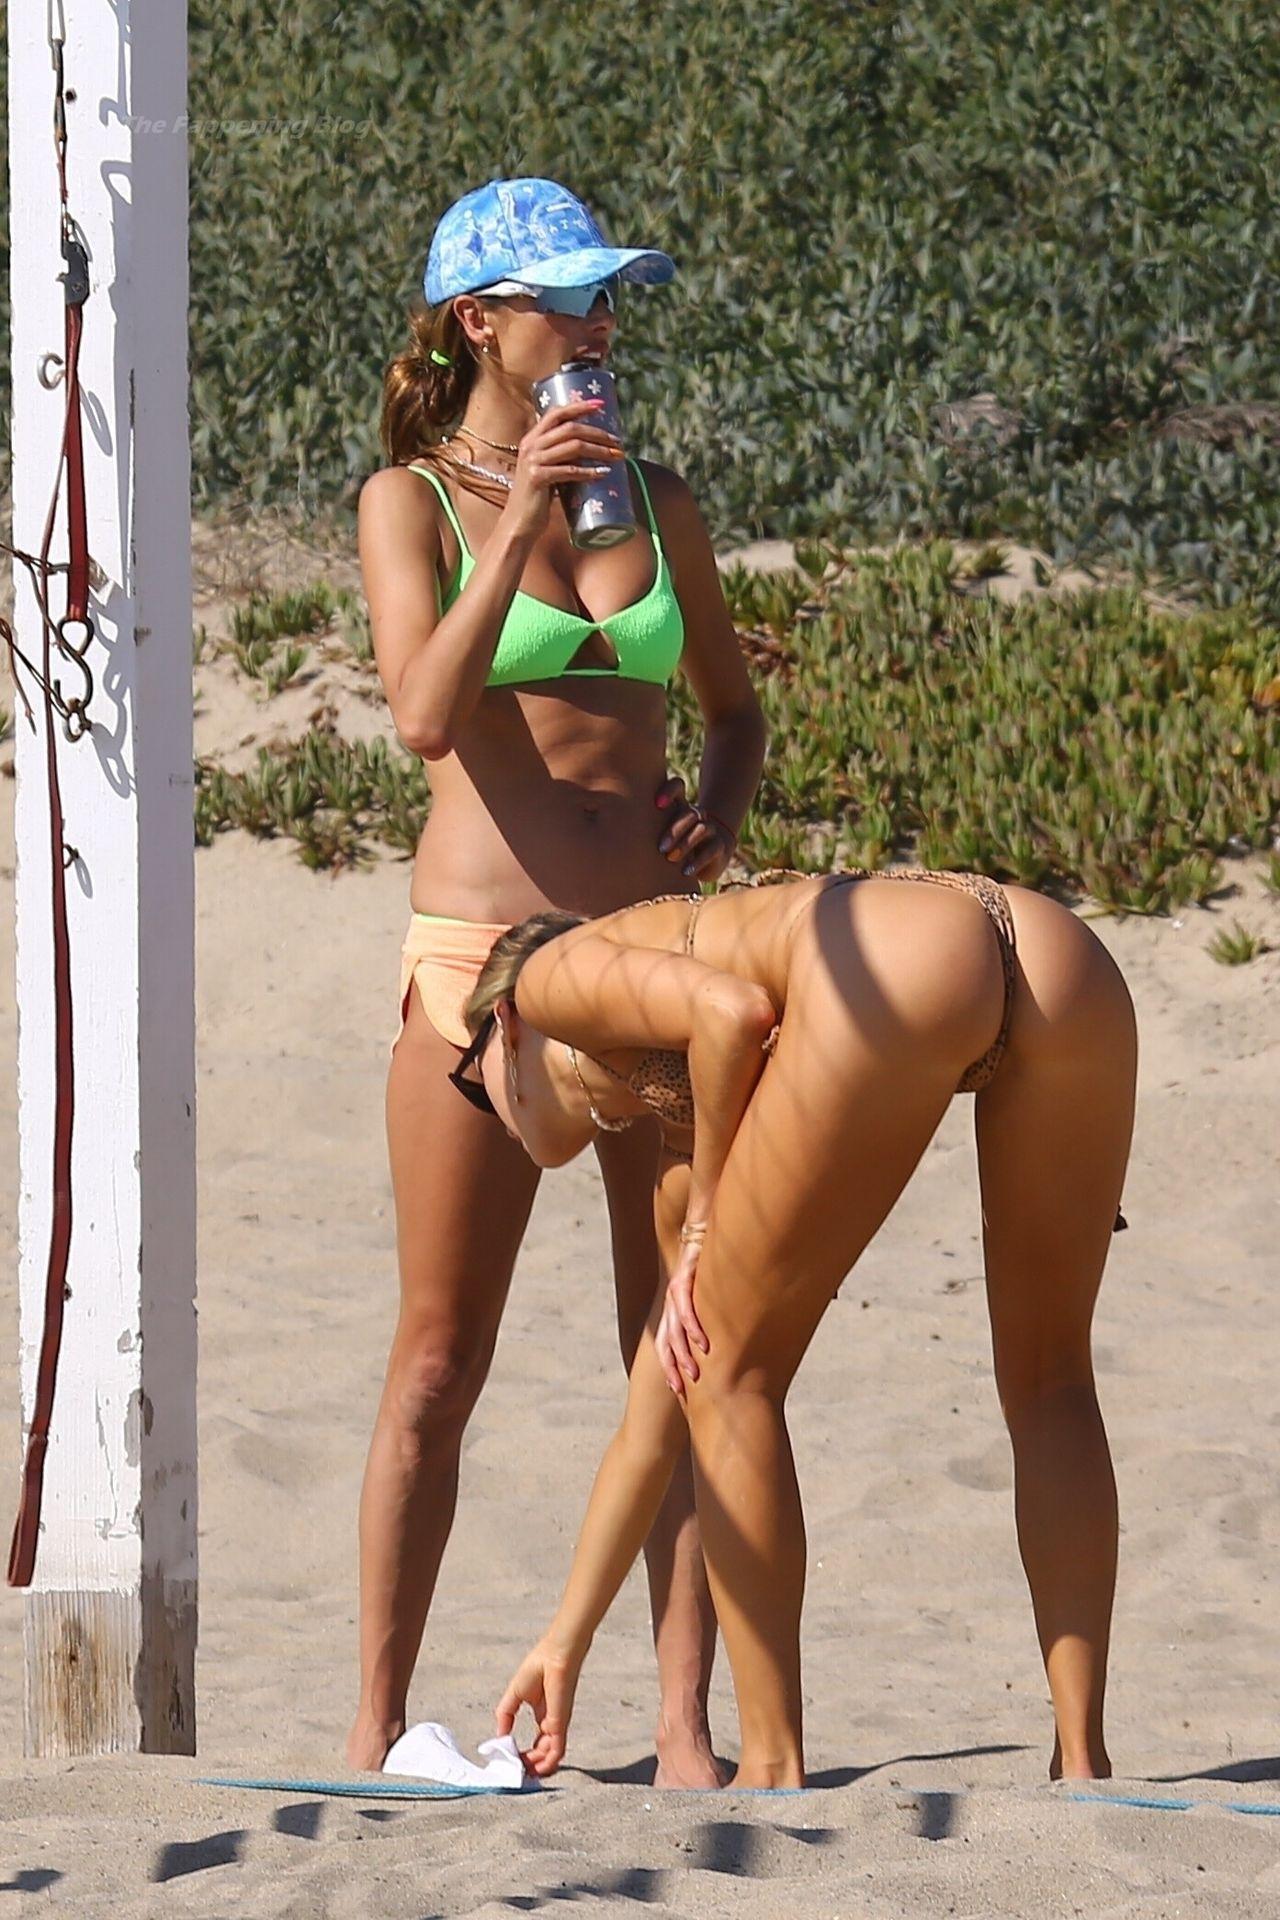 Alessandra-Ambrosio-Sexy-The-Fappening-Blog-391.jpg